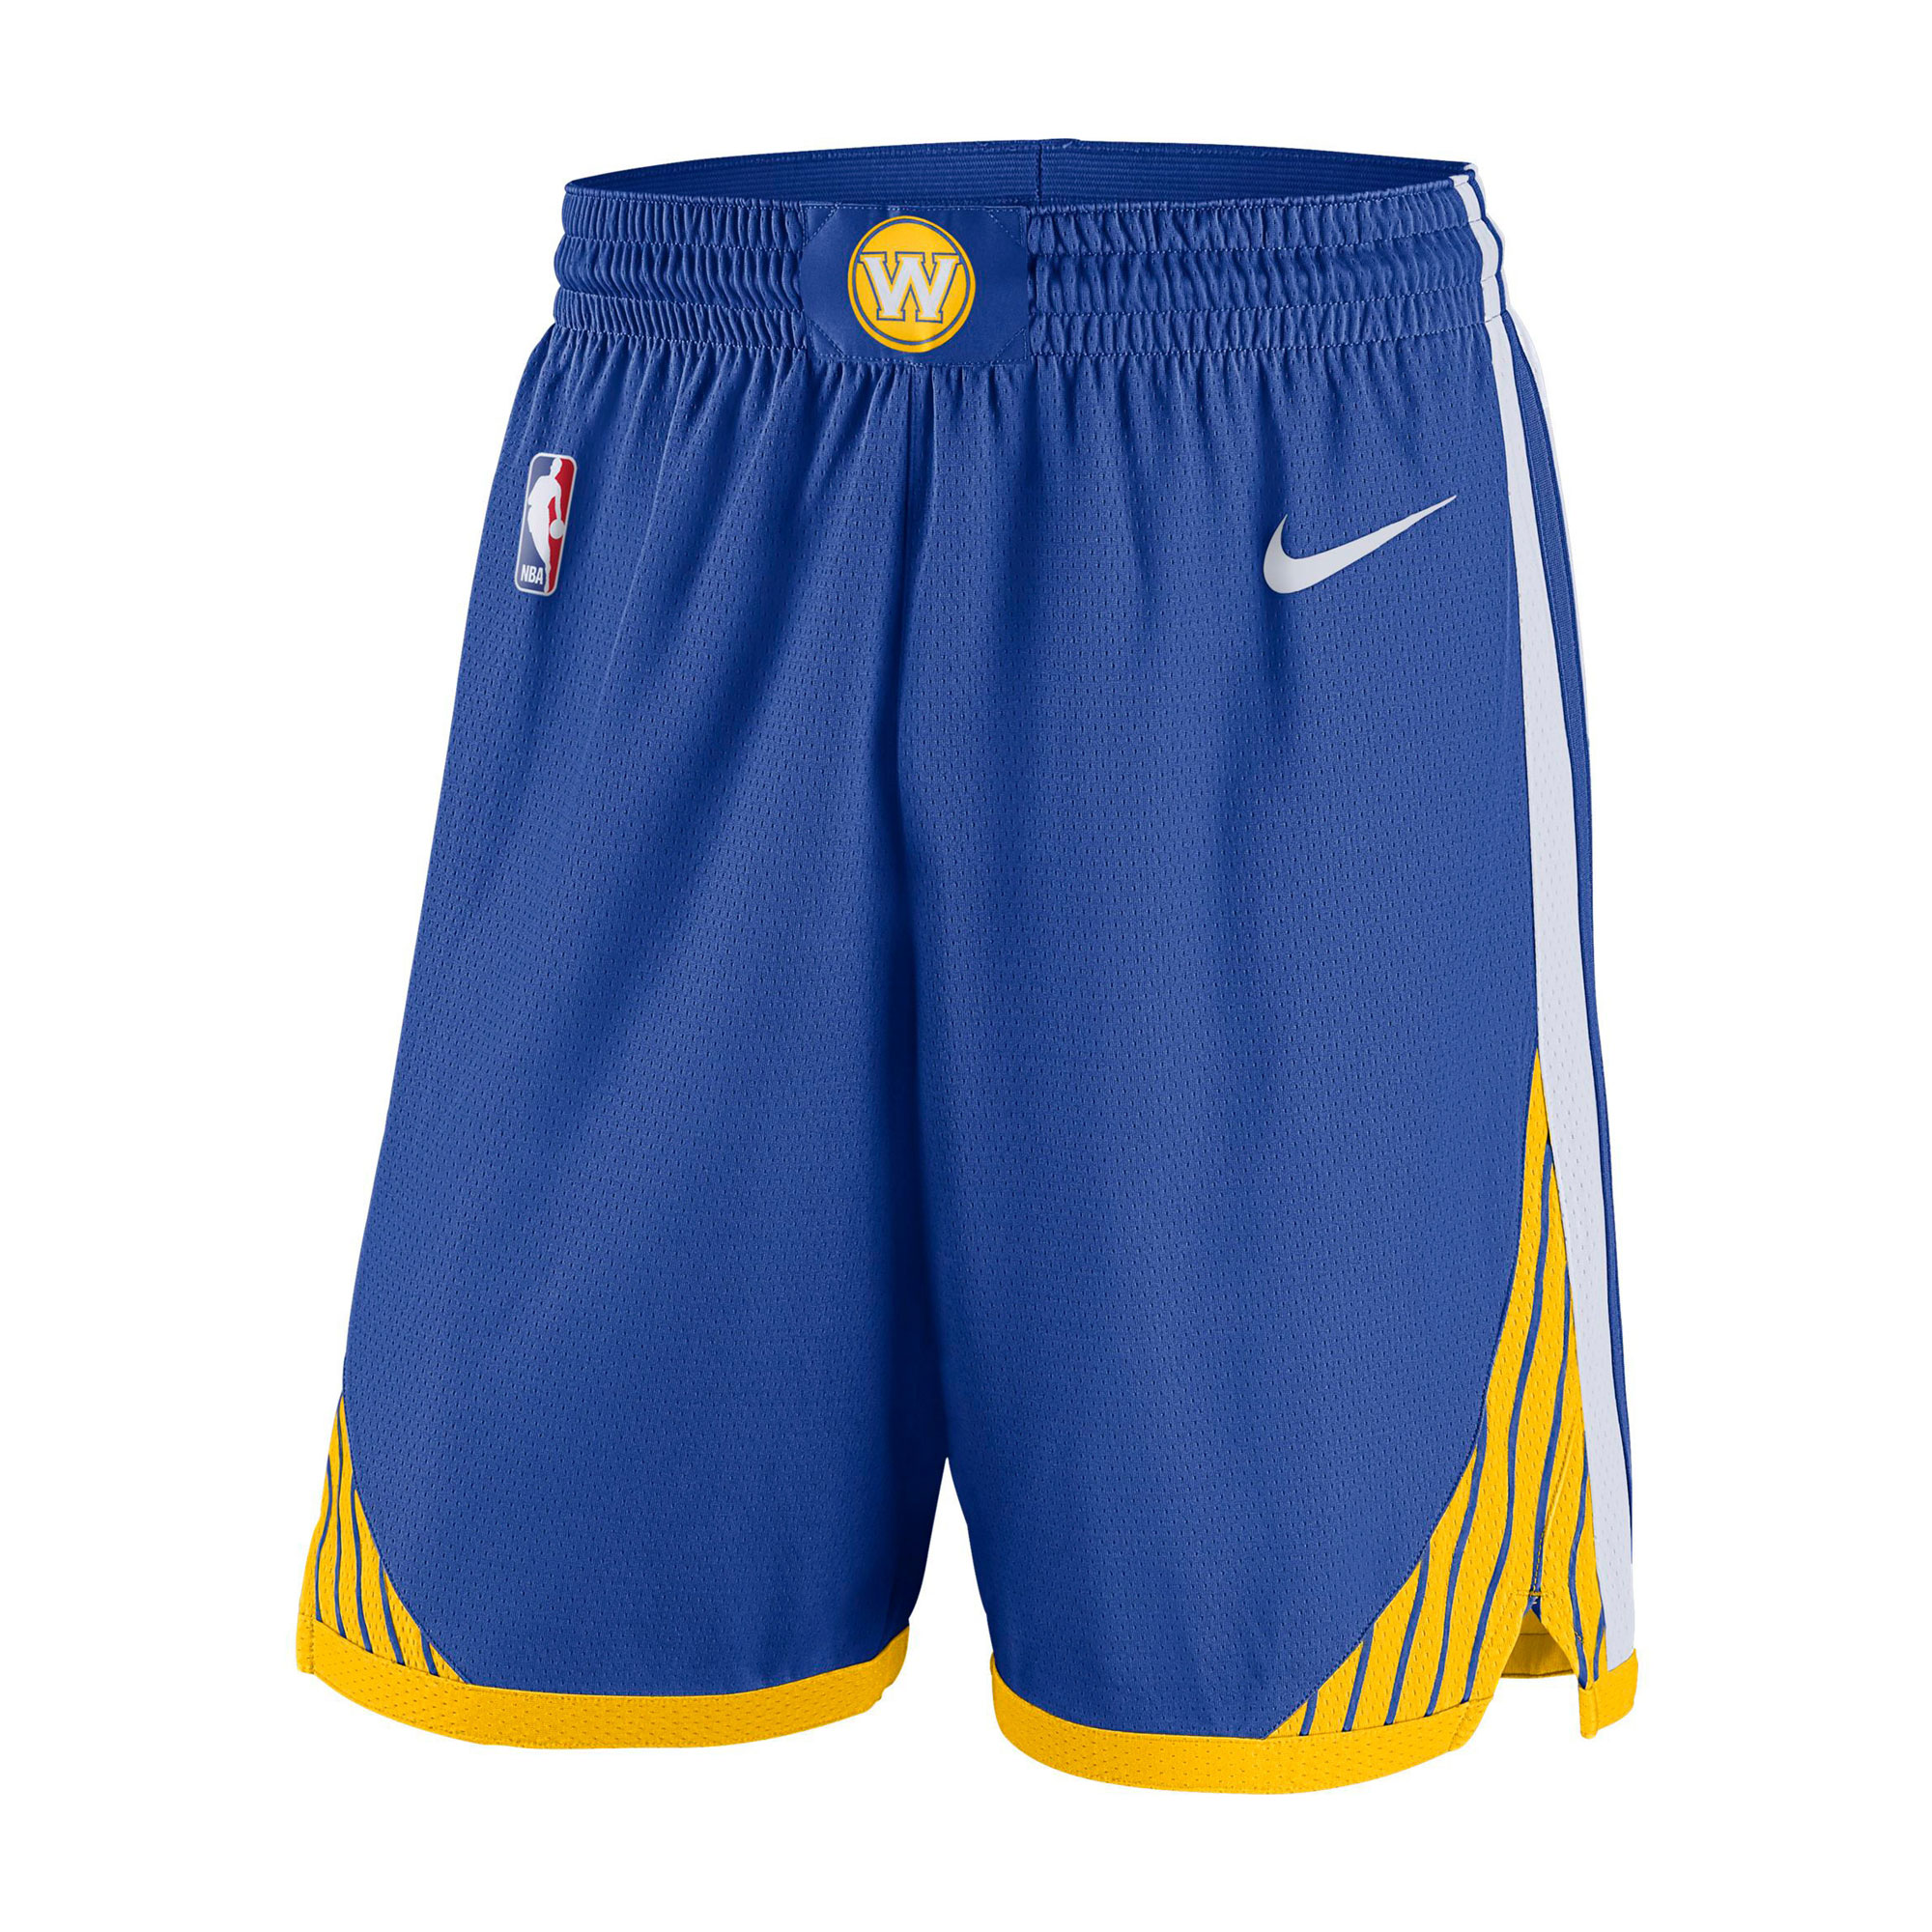 Golden State Warriors Short (SRT-BLU-GSW)